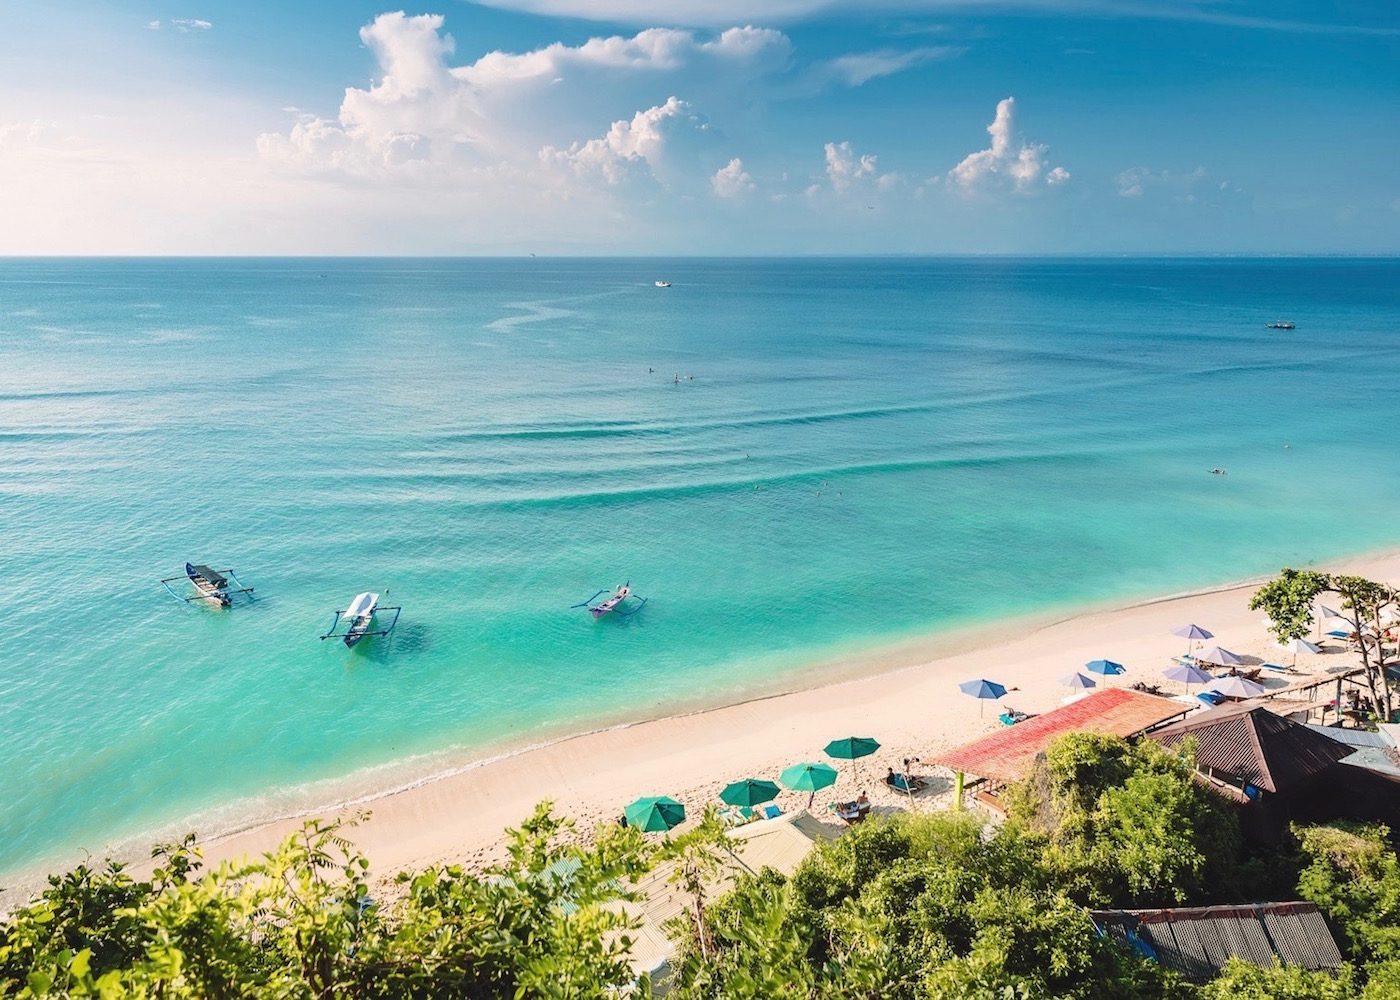 21 BEST BEACHES IN BALI | Updated 2019 | Honeycombers Bali